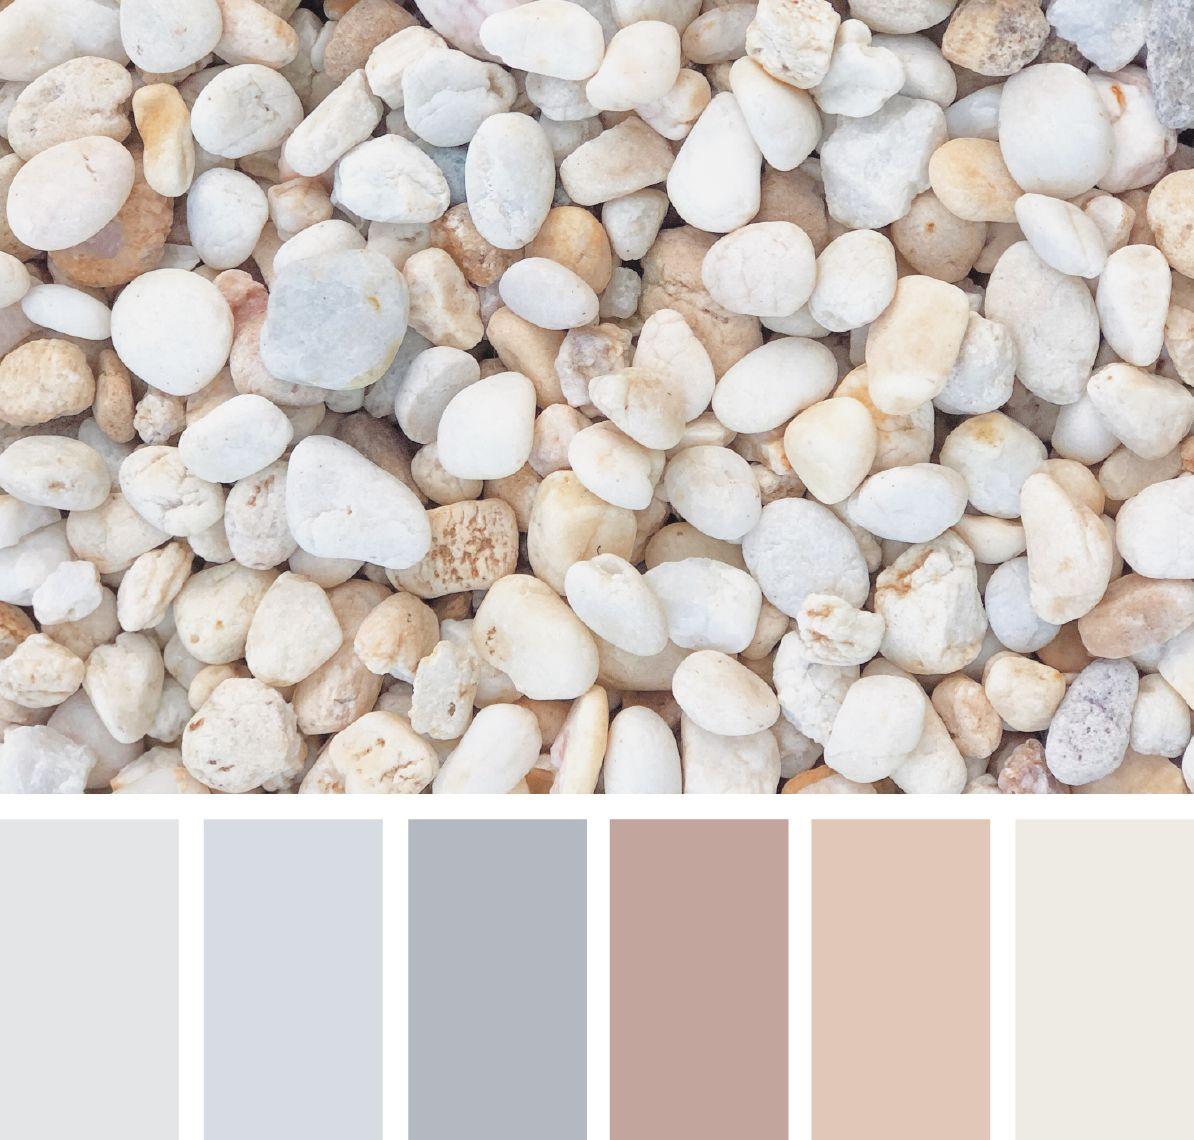 Cappuccino Farbe Kombinieren: Diese Wandfarben Passen